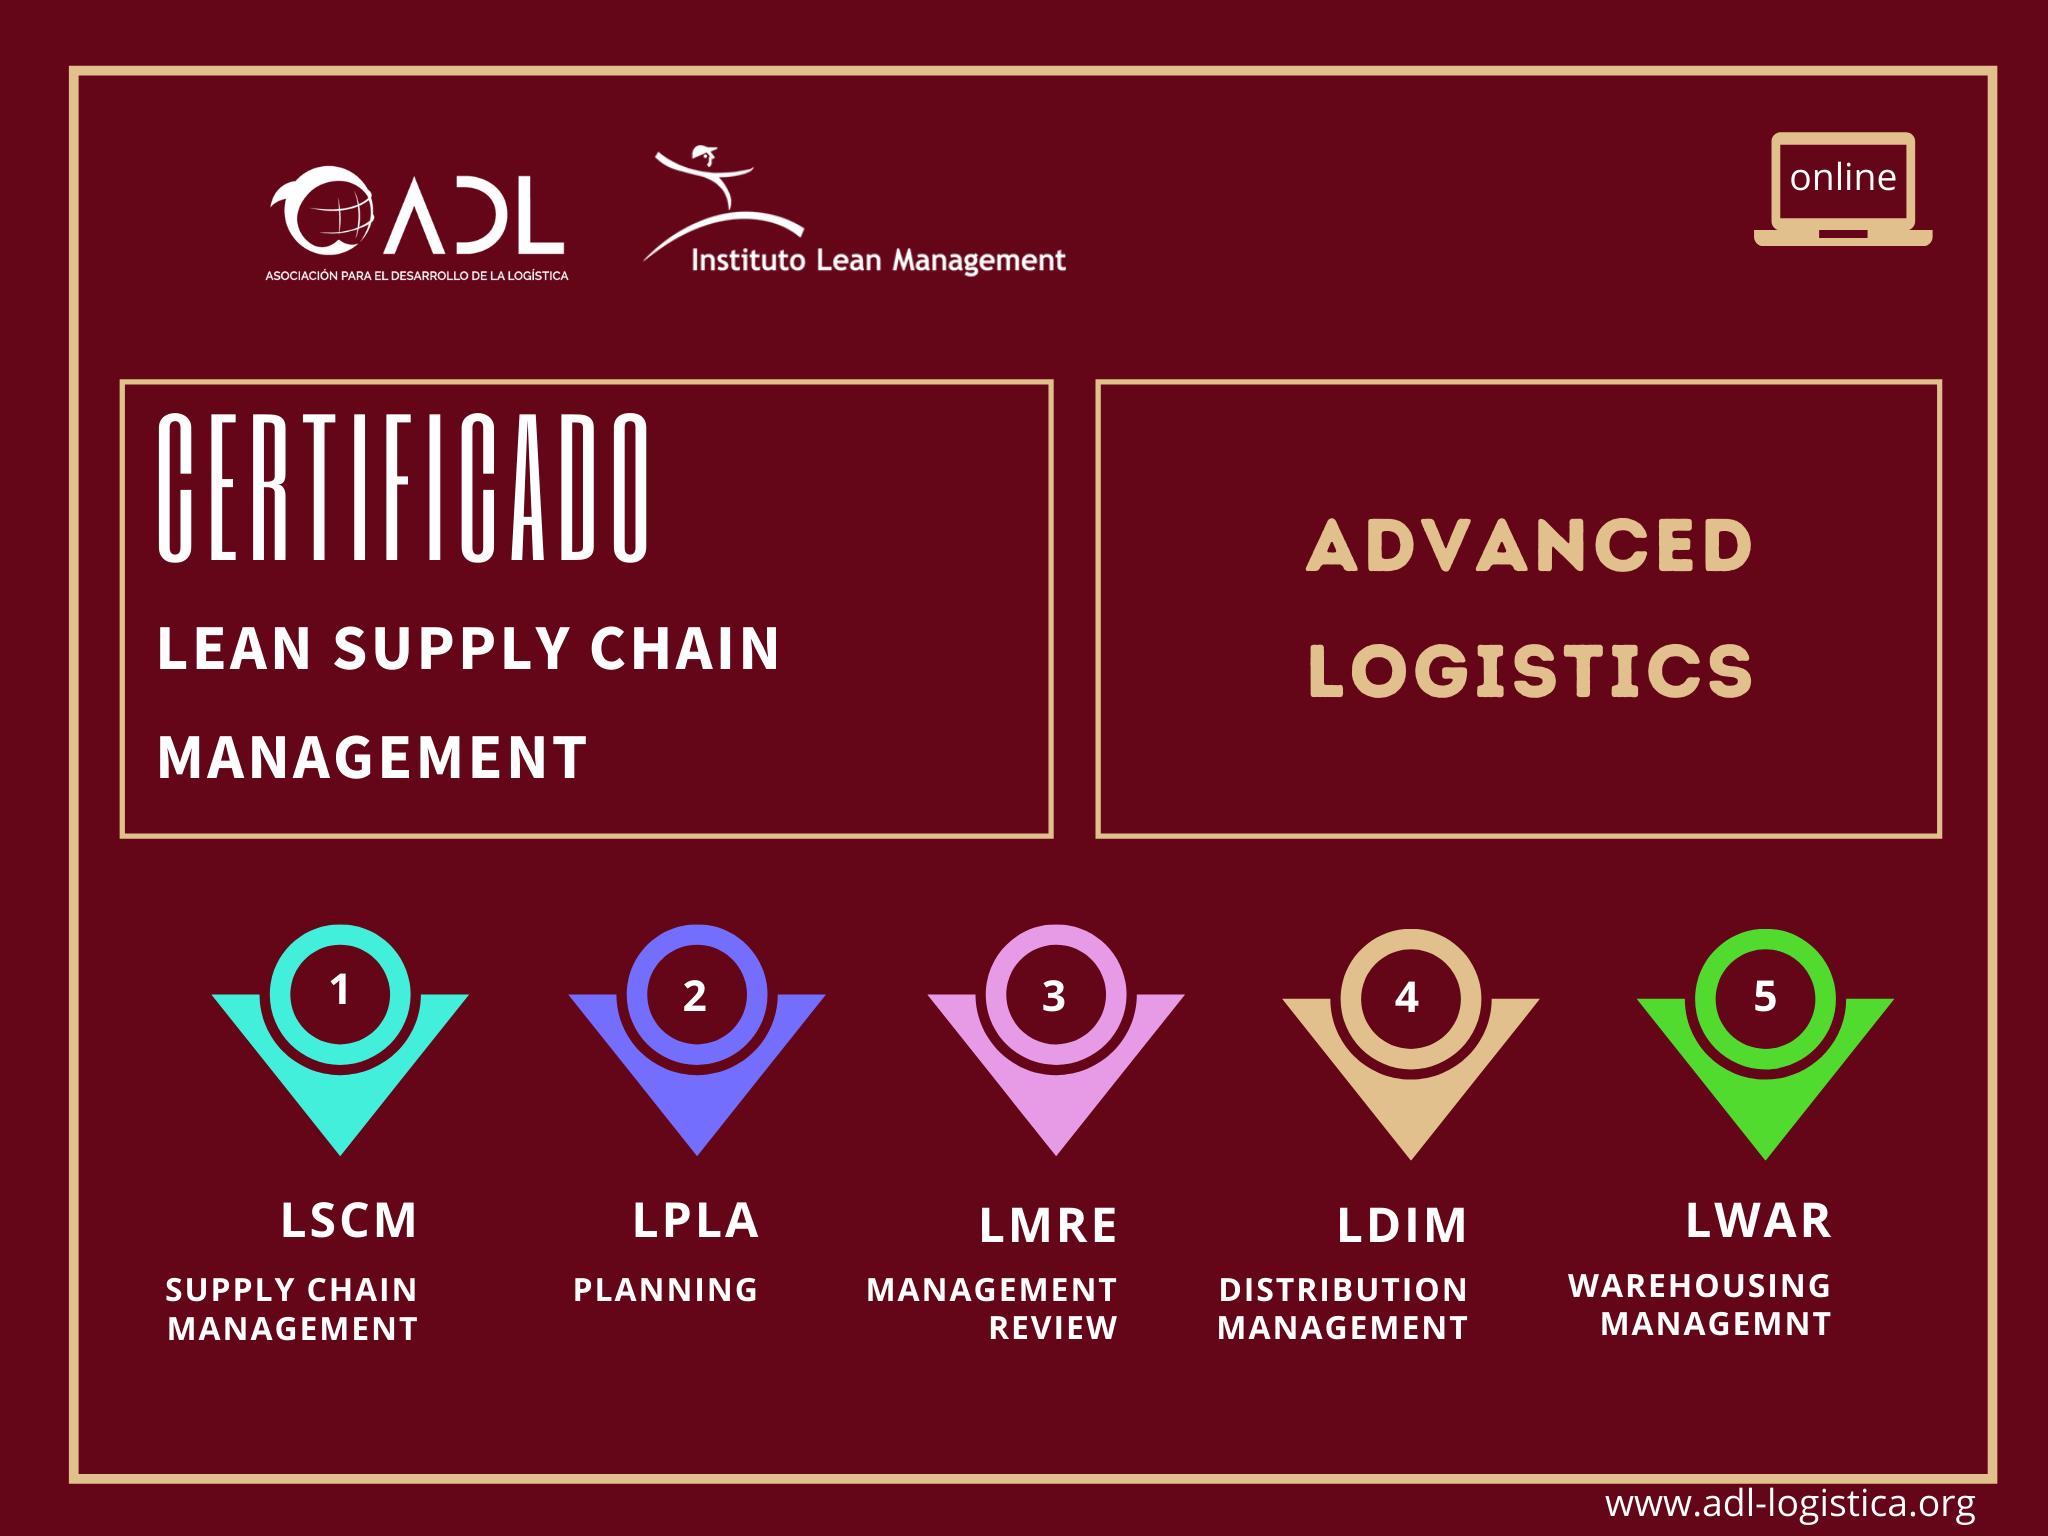 Certificado Lean Supply Chain Management Advanzado Logistica   Cámara de Comercio de Murcia   ADL Logística